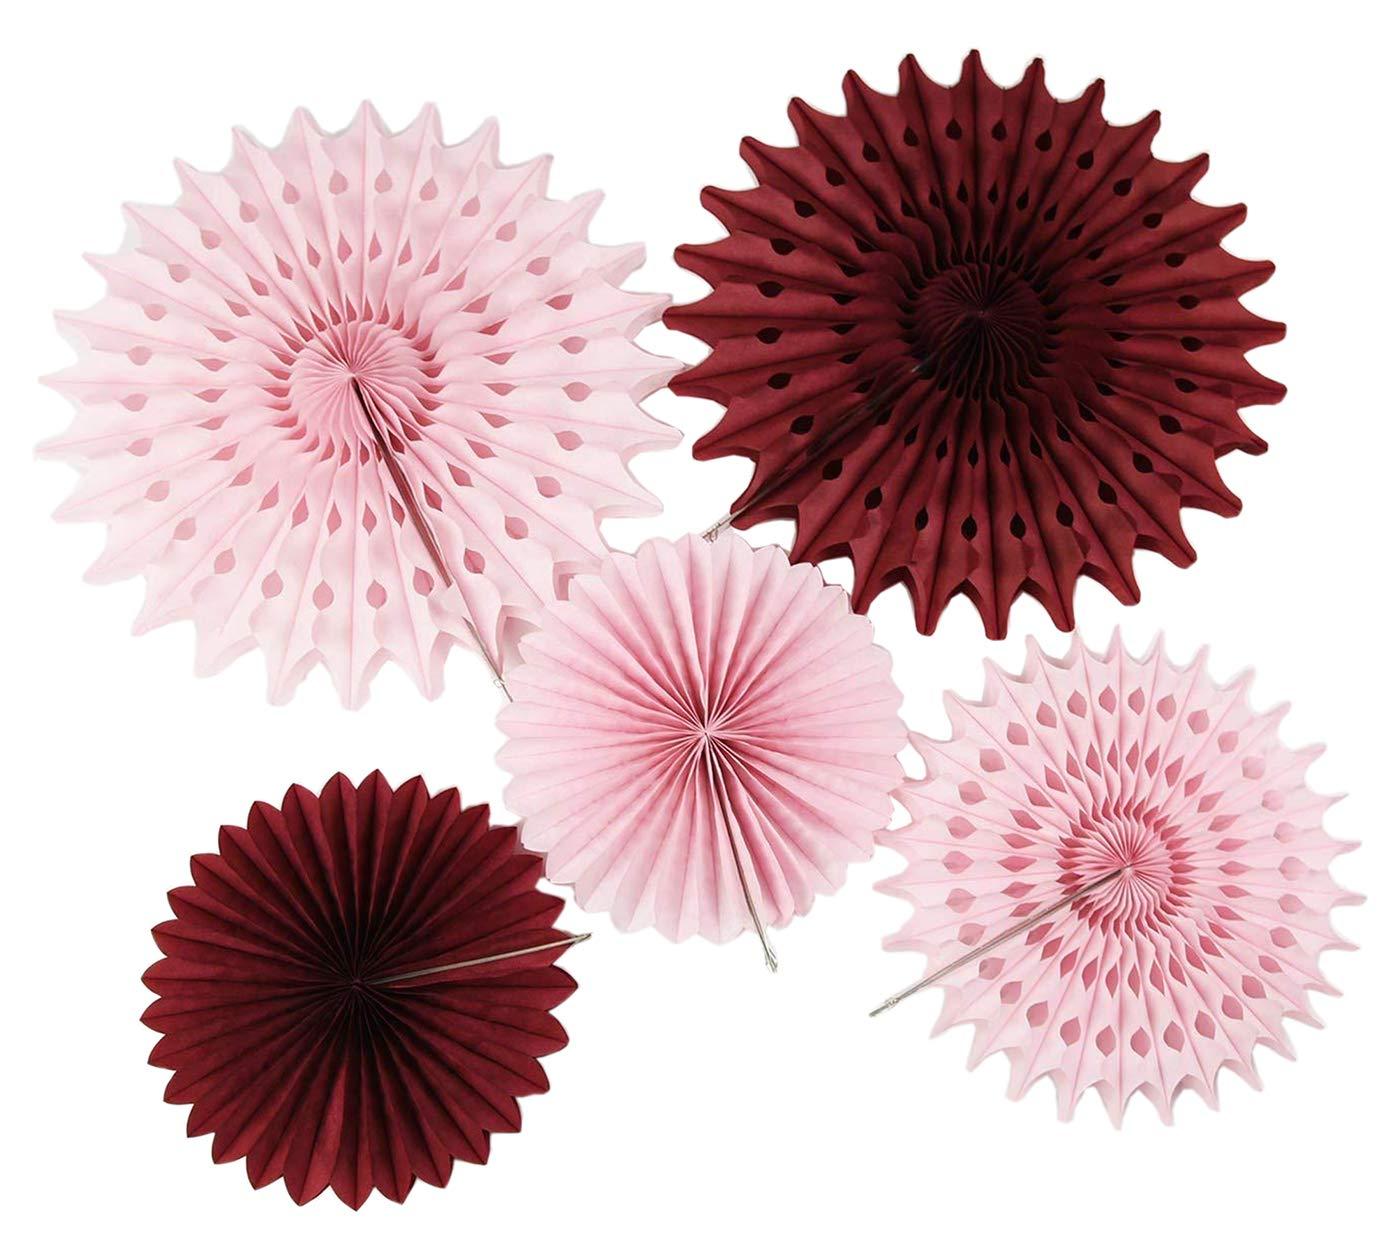 Burgundy Pink Bridal Shower Decorations Pinwheels Paper Fan 7pcs Burgundy Cream Pink Tissue Paper Fans Tissue Paper Flower Burgundy Birthday Decorations Valentines Bachelorette Party Decorations